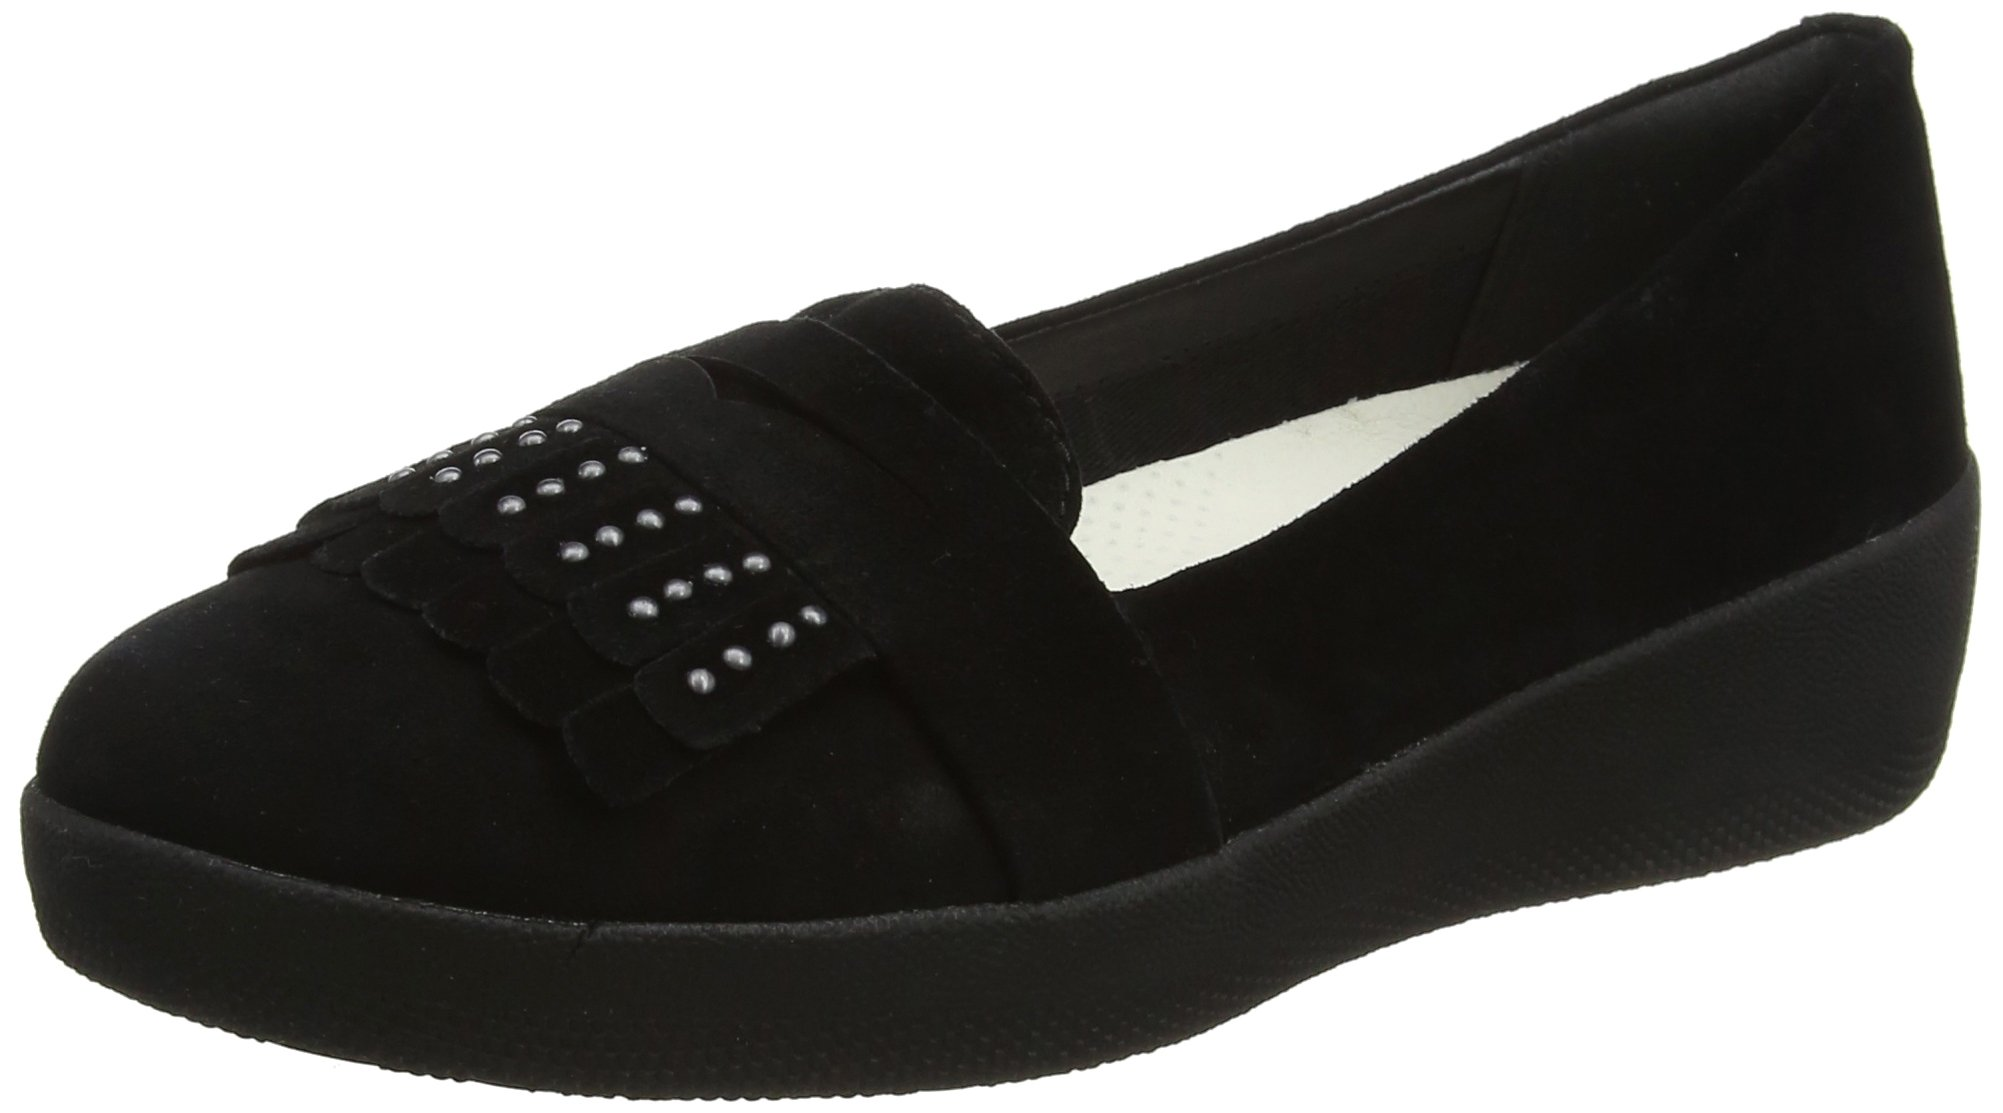 Fringey Fitflop Eu FemmeNoirblack SneakerloaferMocassins 00137 Studded 5 PZiukX